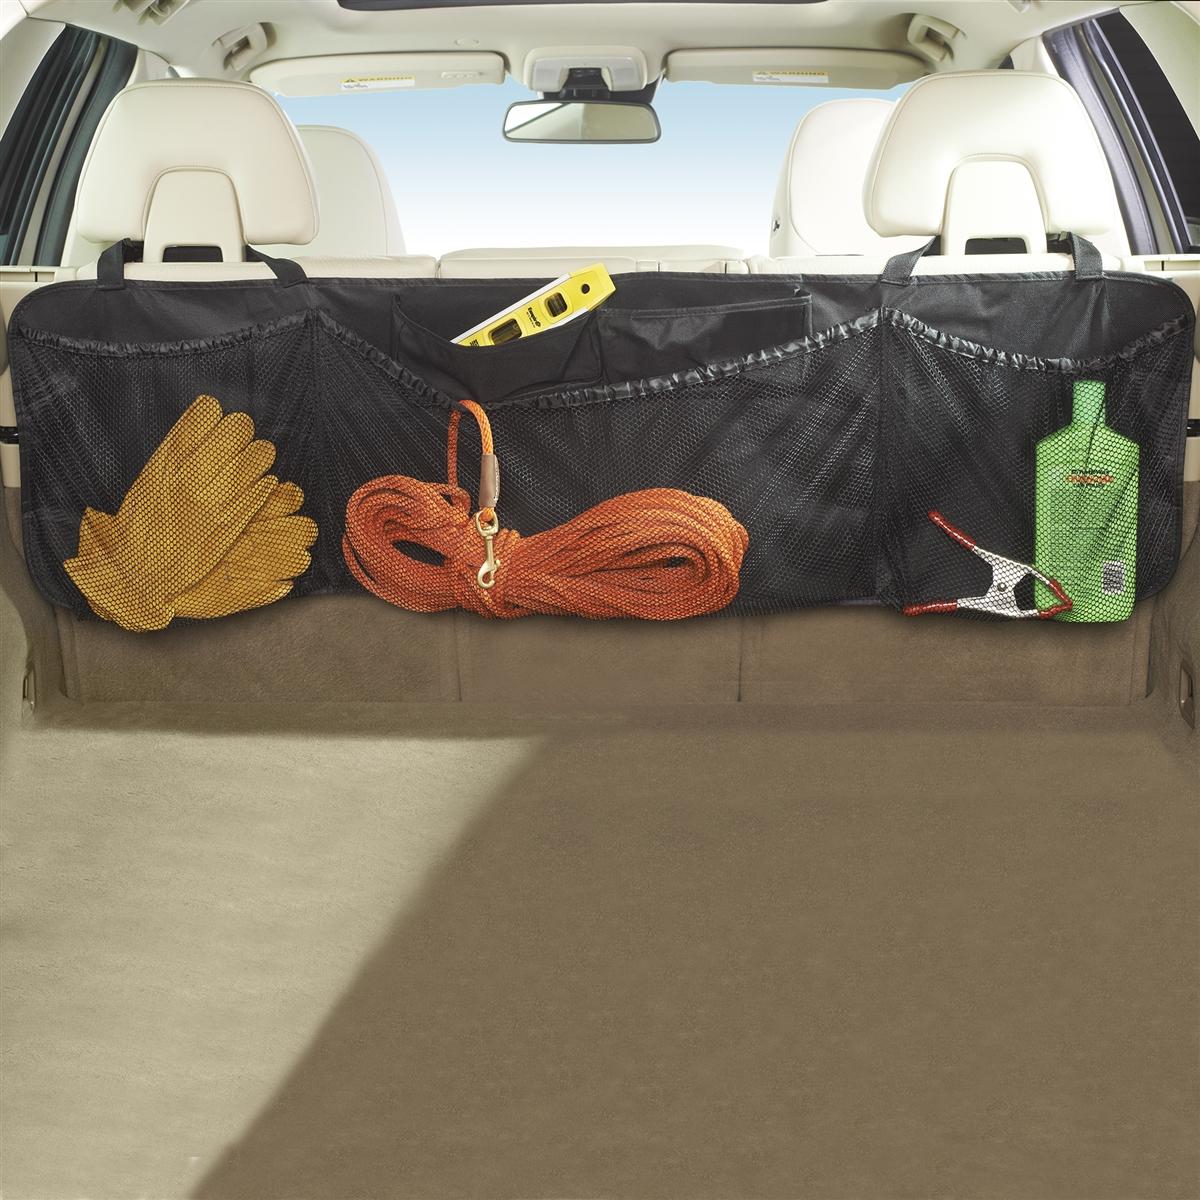 High Road Cargo Pack Suv Cargo Organizer Seat Back Organizer